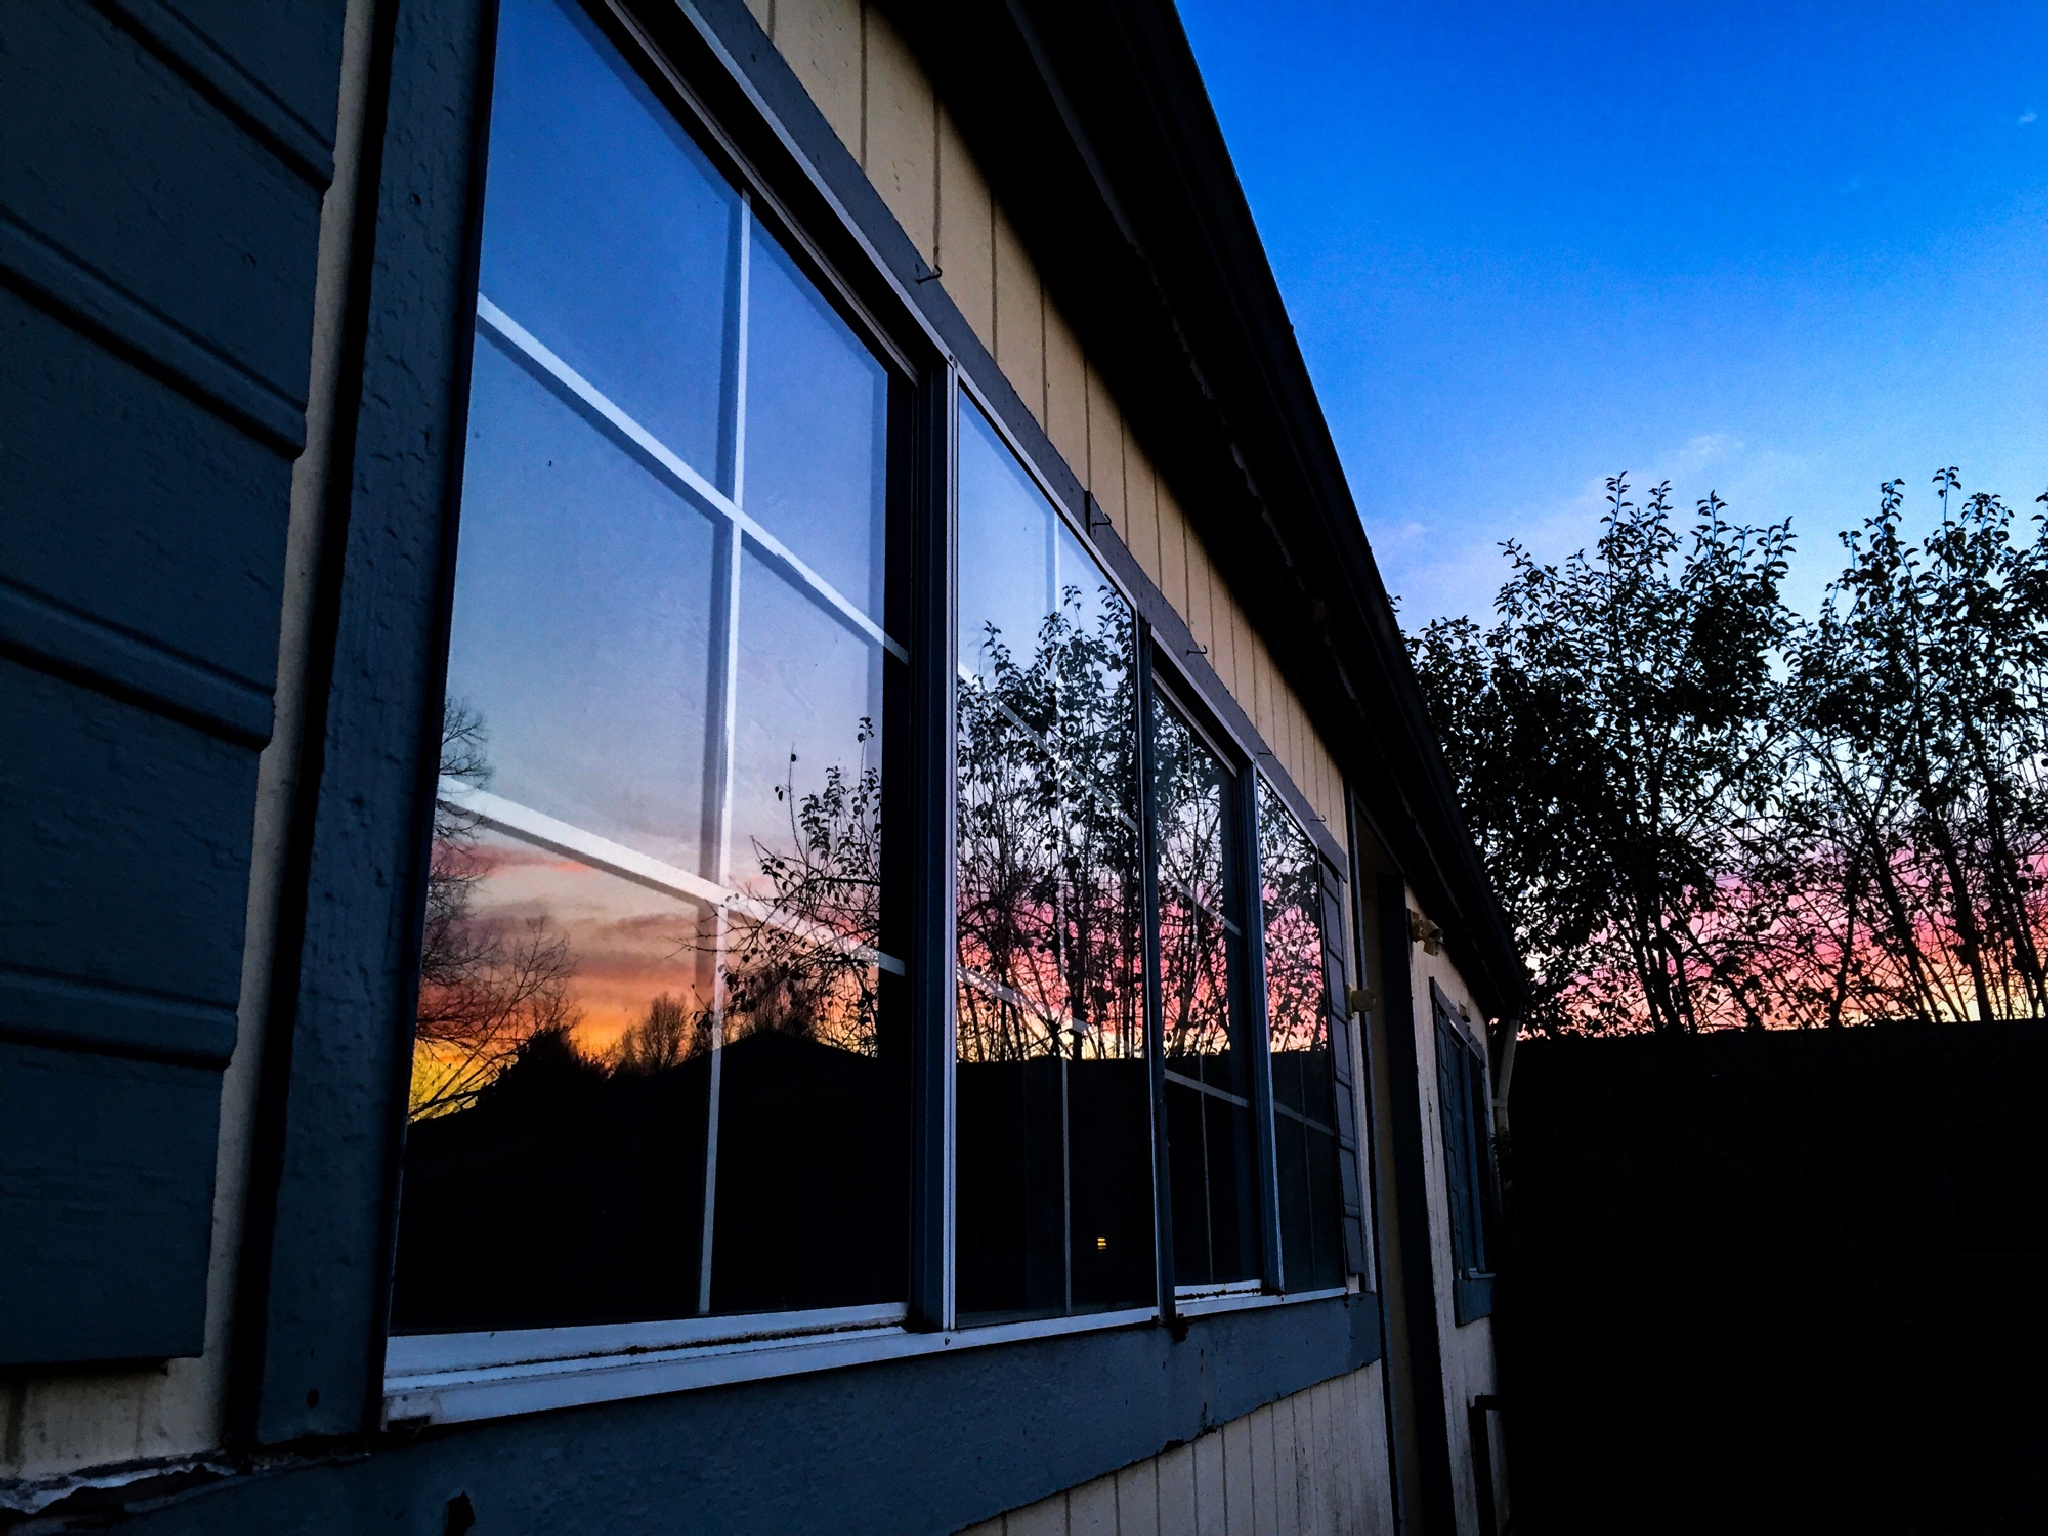 Window to sky by peyton0104